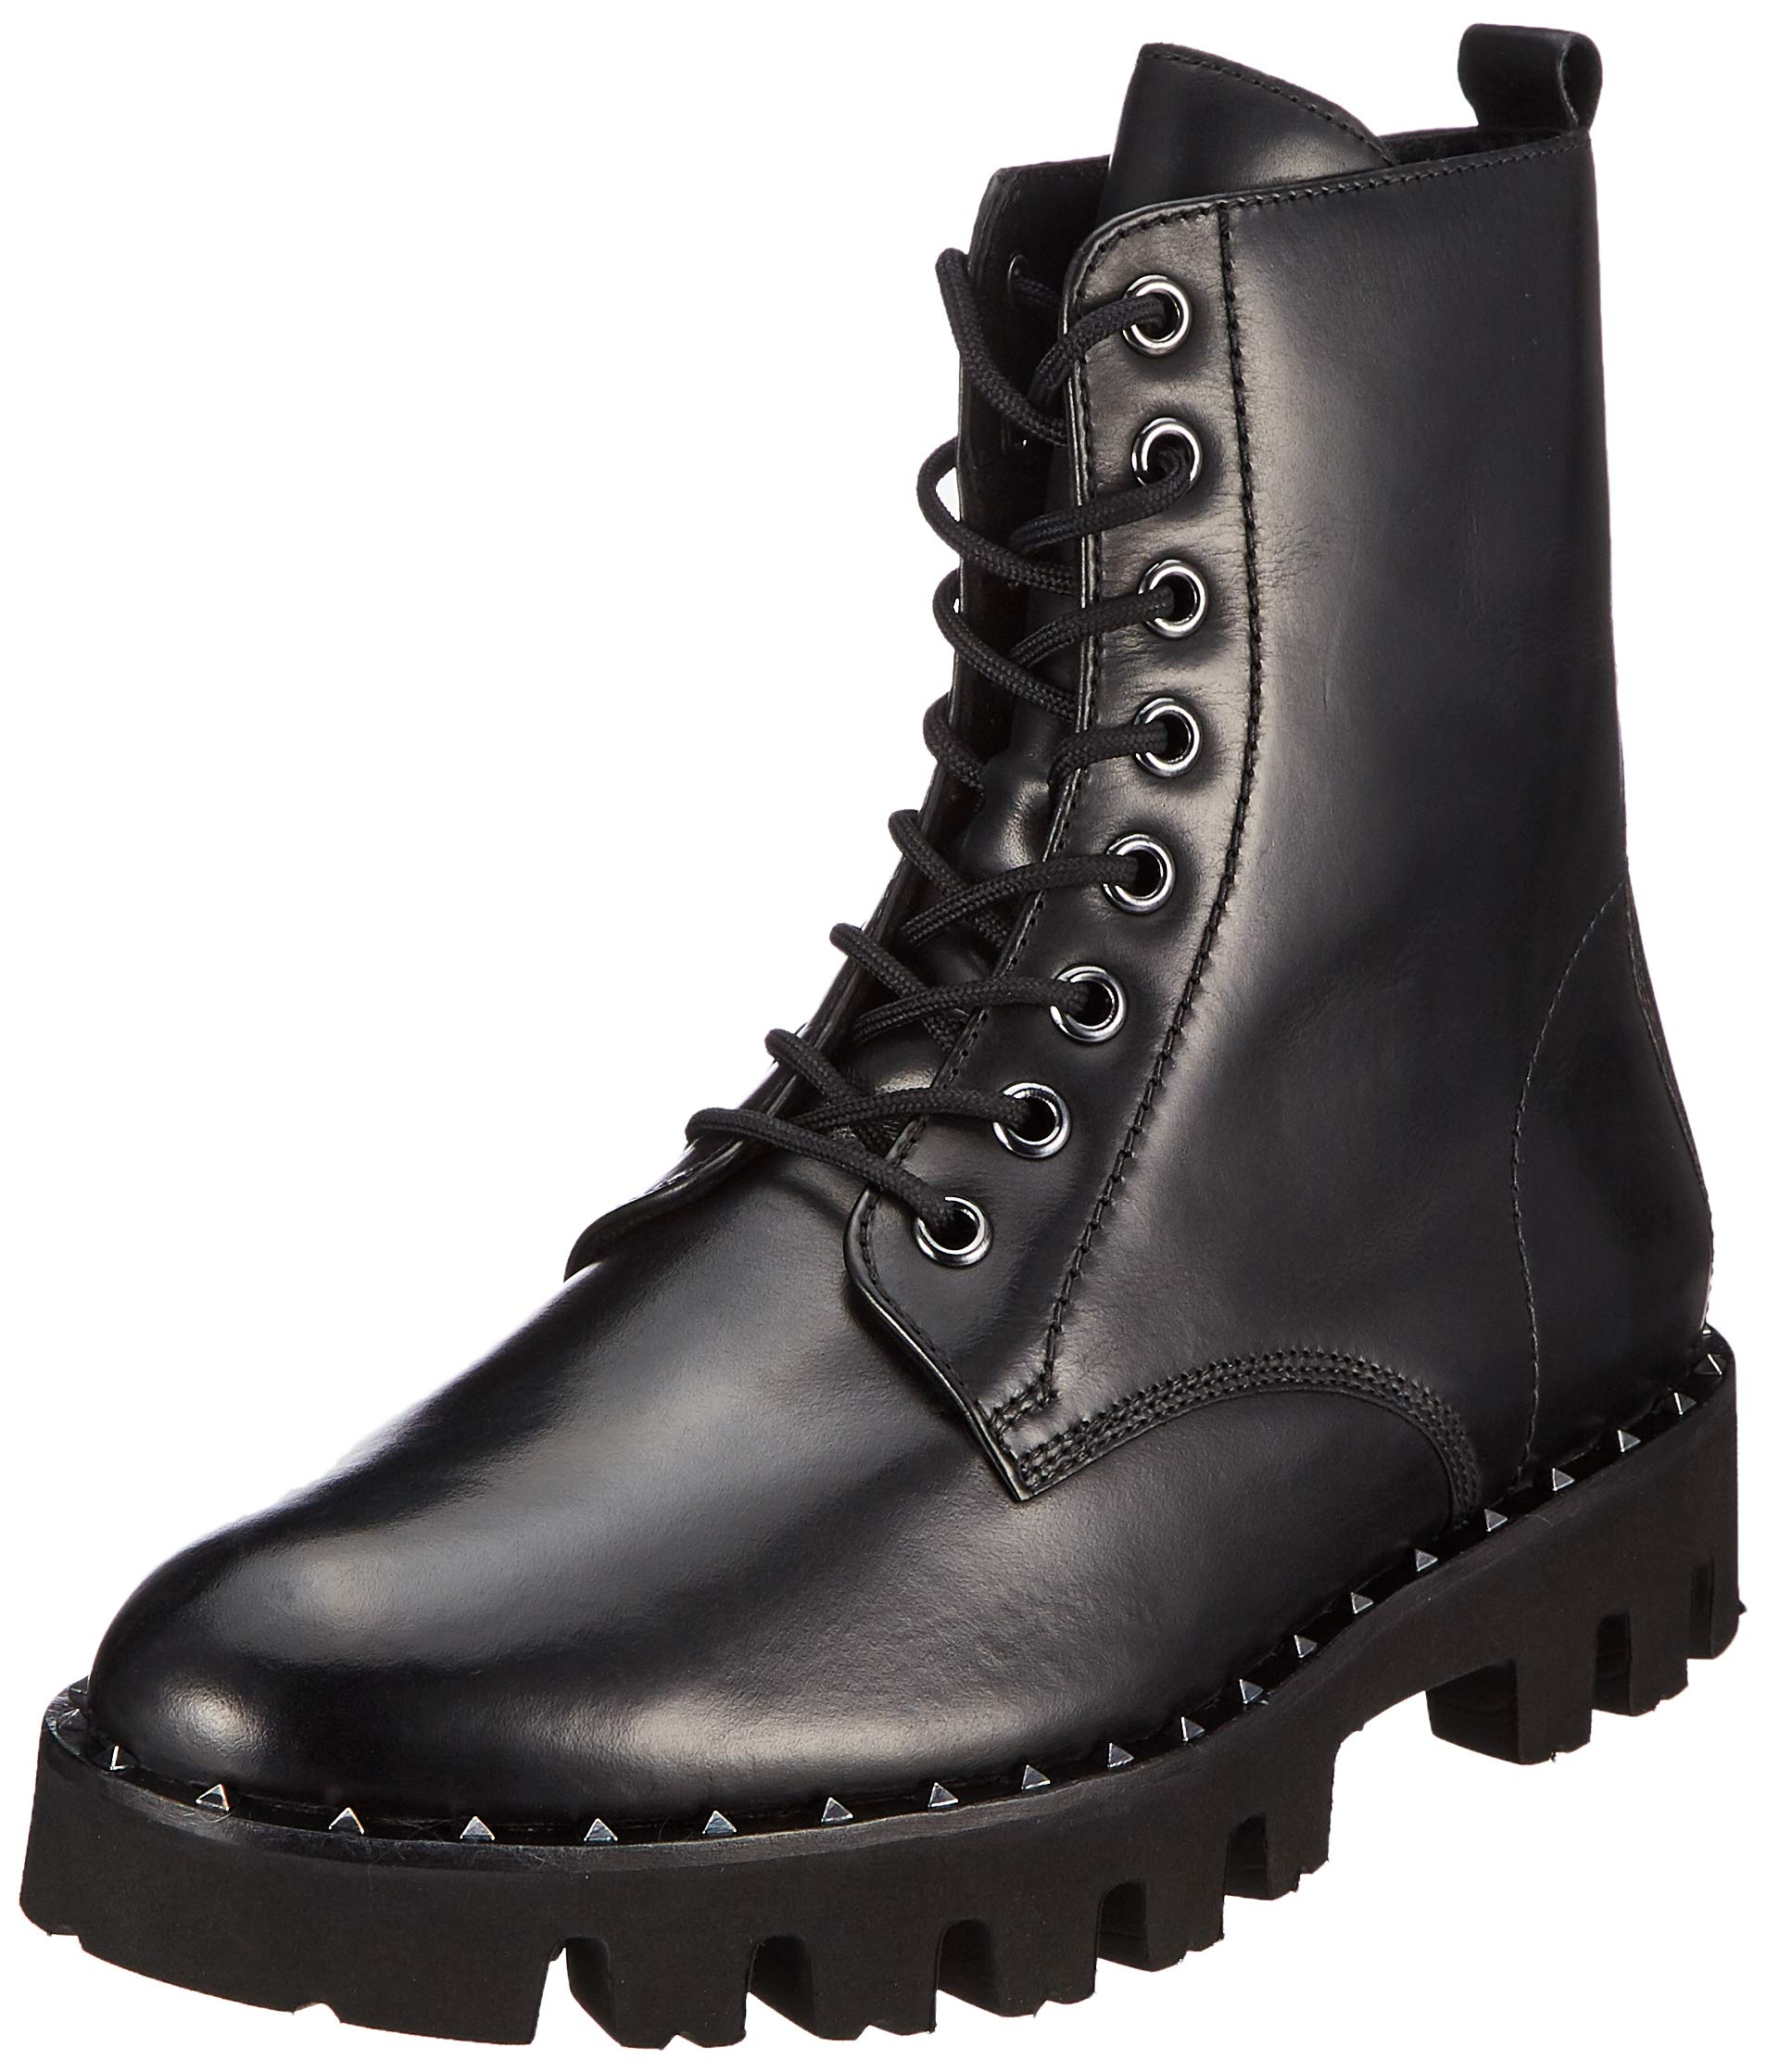 Högl 010039 Eu FemmeNoirschwarz HikerRangers Boots gbf6Yyv7